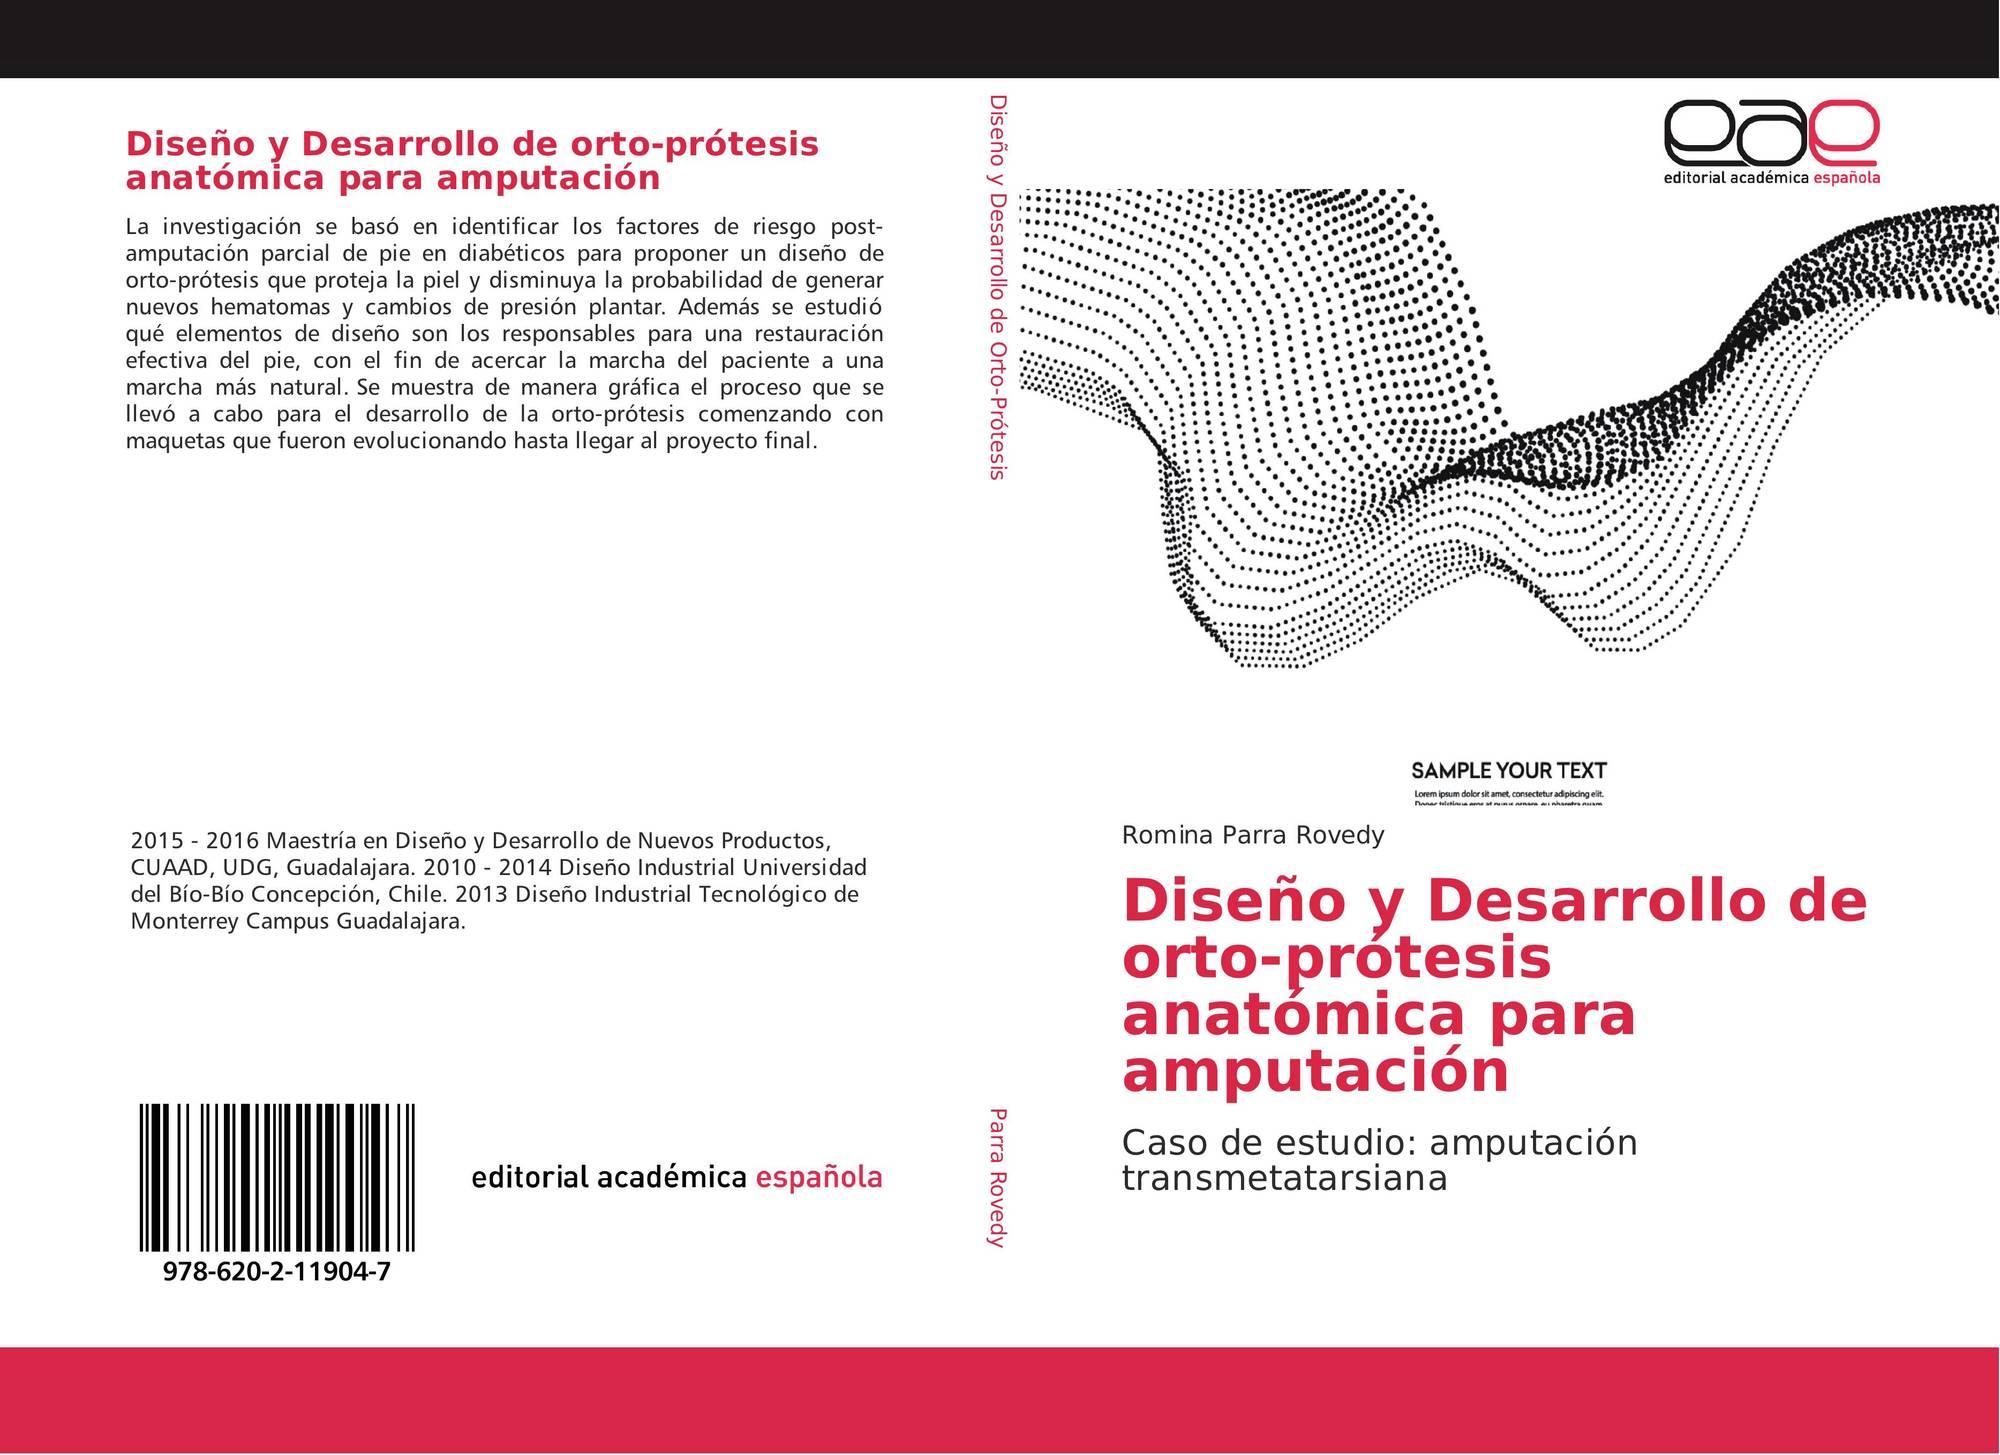 prótesis de amputación de diabetes